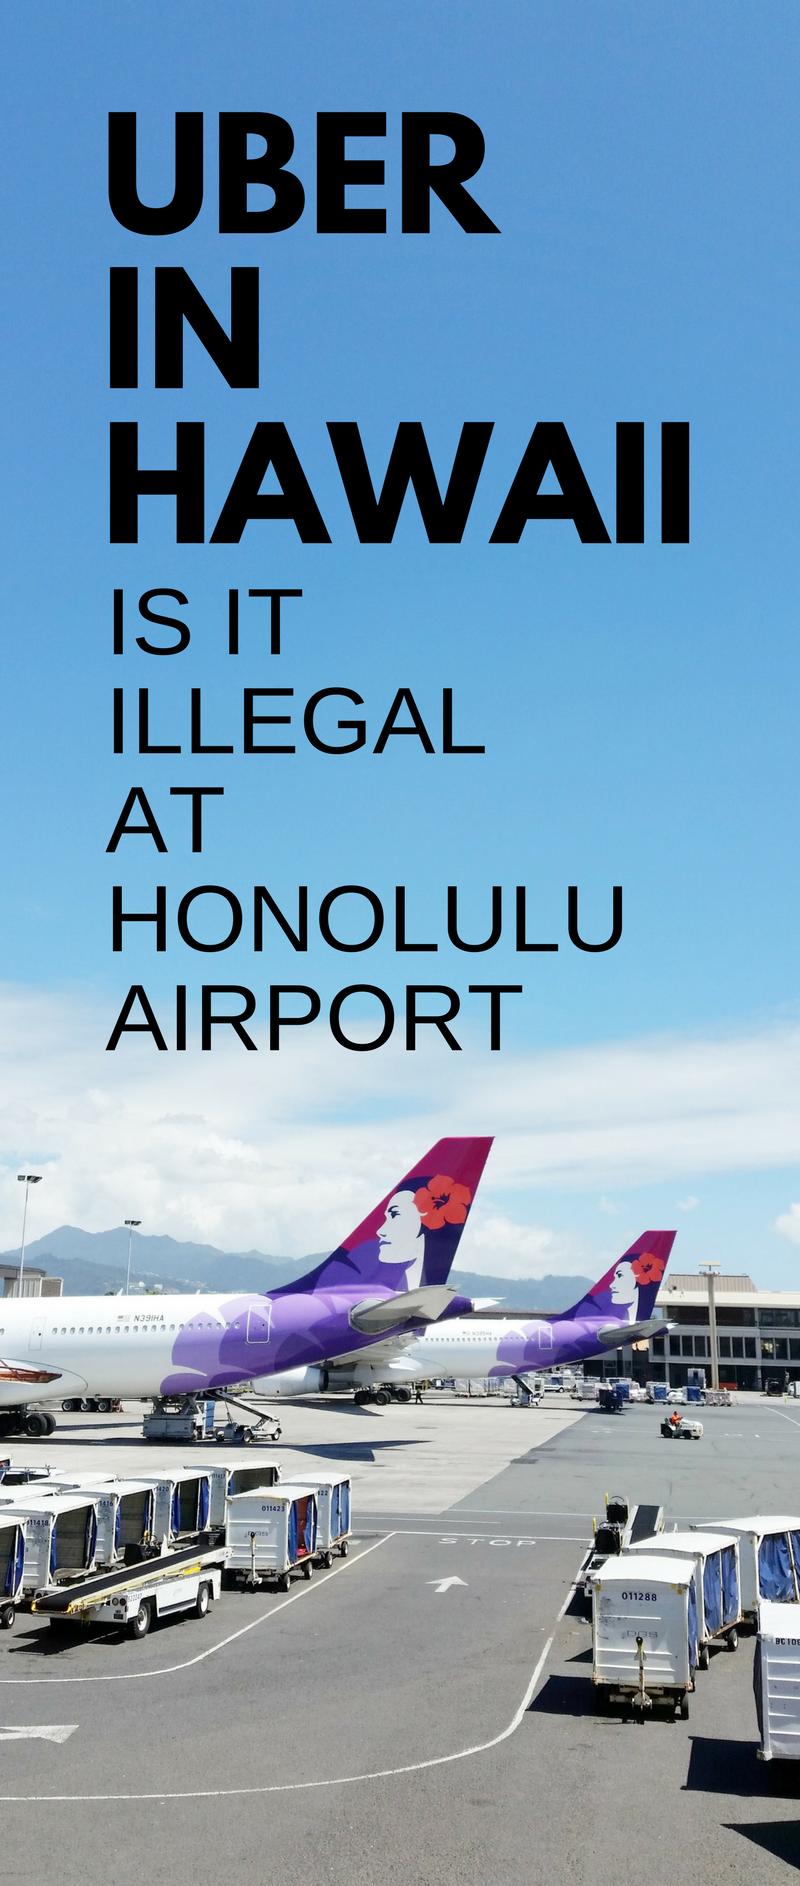 Honolulu Airport To Waikiki By Uber Is It Illegal Hnl Oahu Hawaii